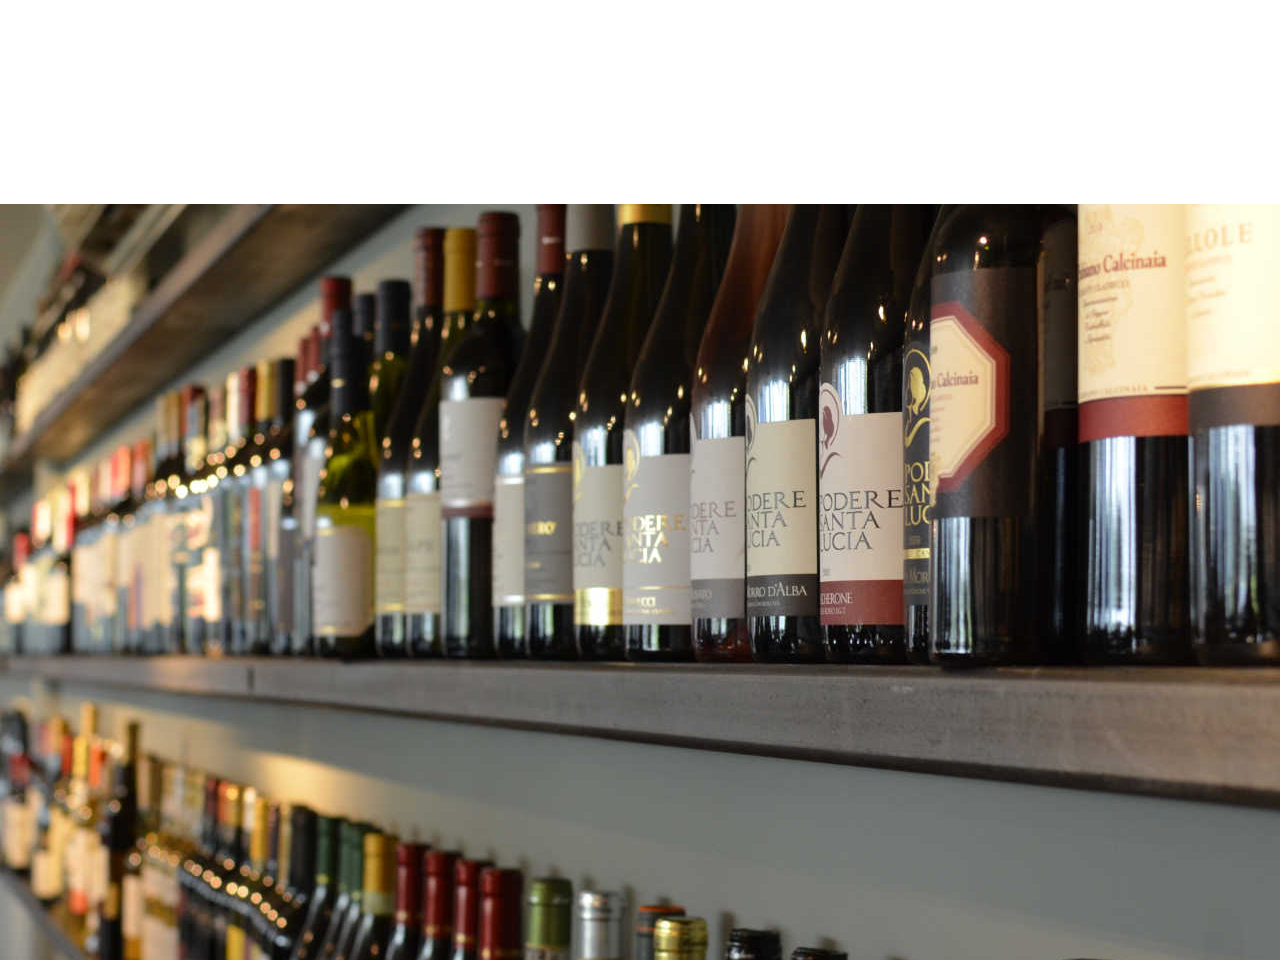 meer dan 1000 lekkere wijnen uit Italië Spanje Portugal België Chili Zuid-Afrika Argentinië Oostenrijk Duitsland